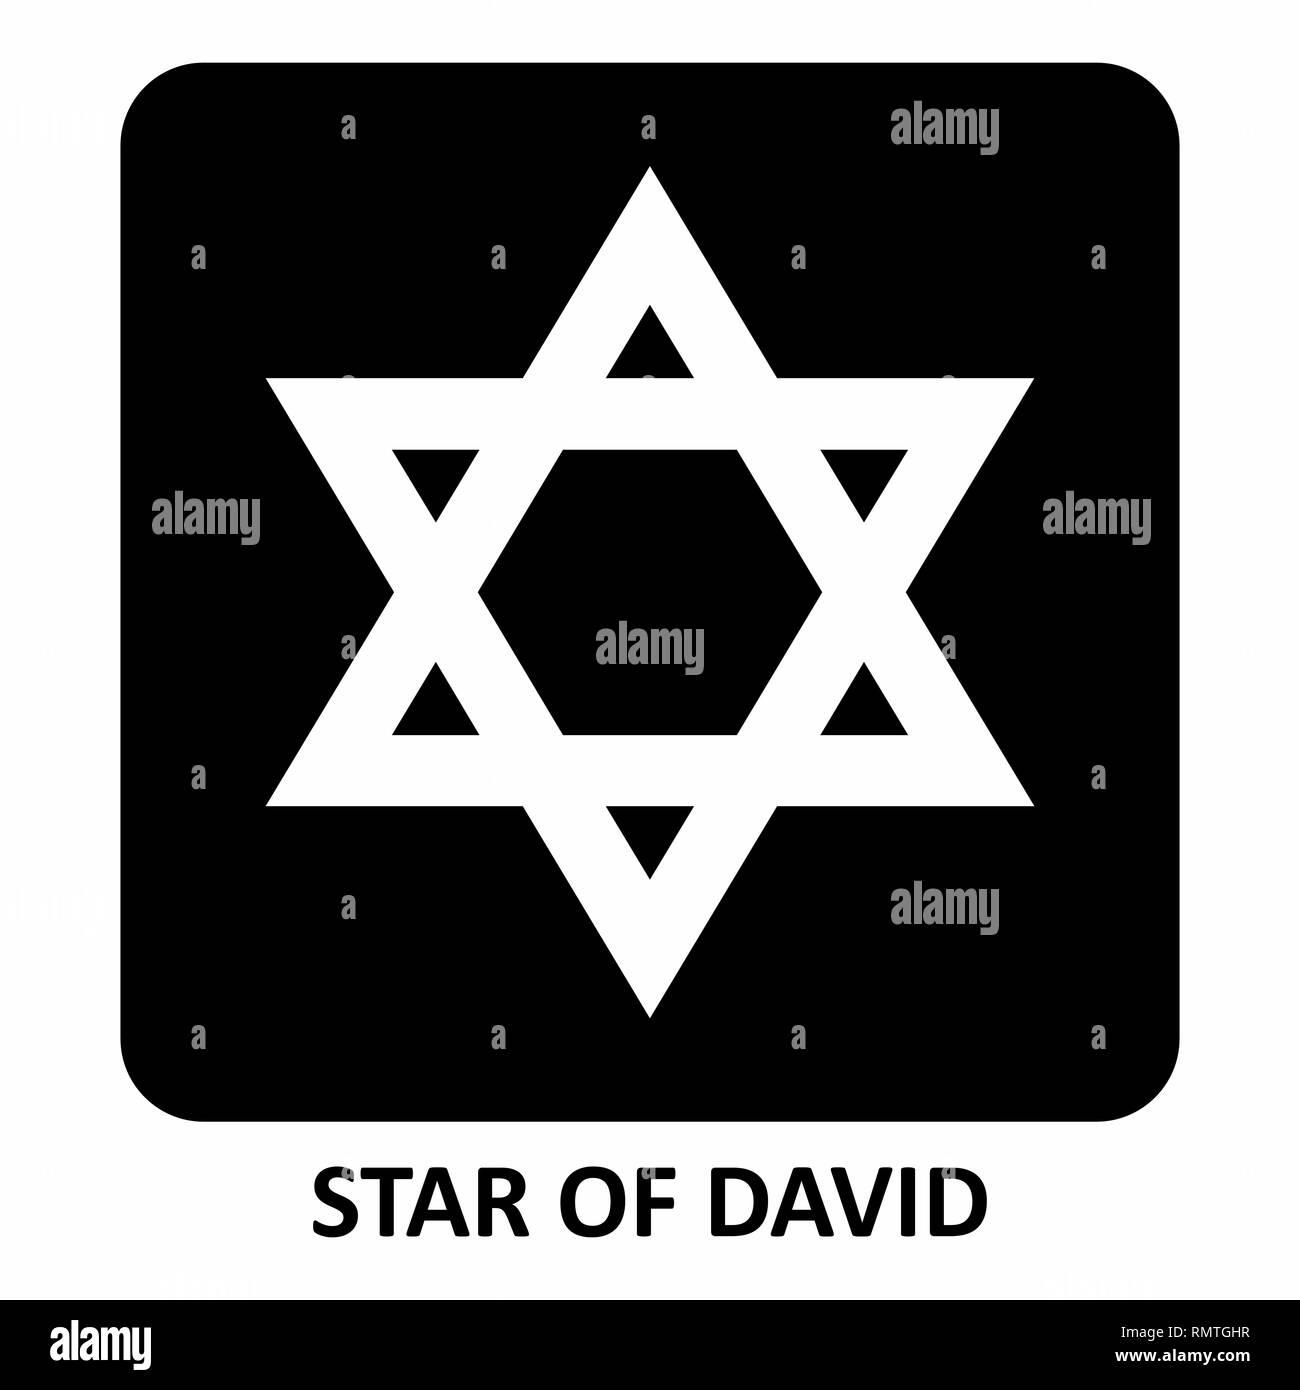 Star of David illustration - Stock Image